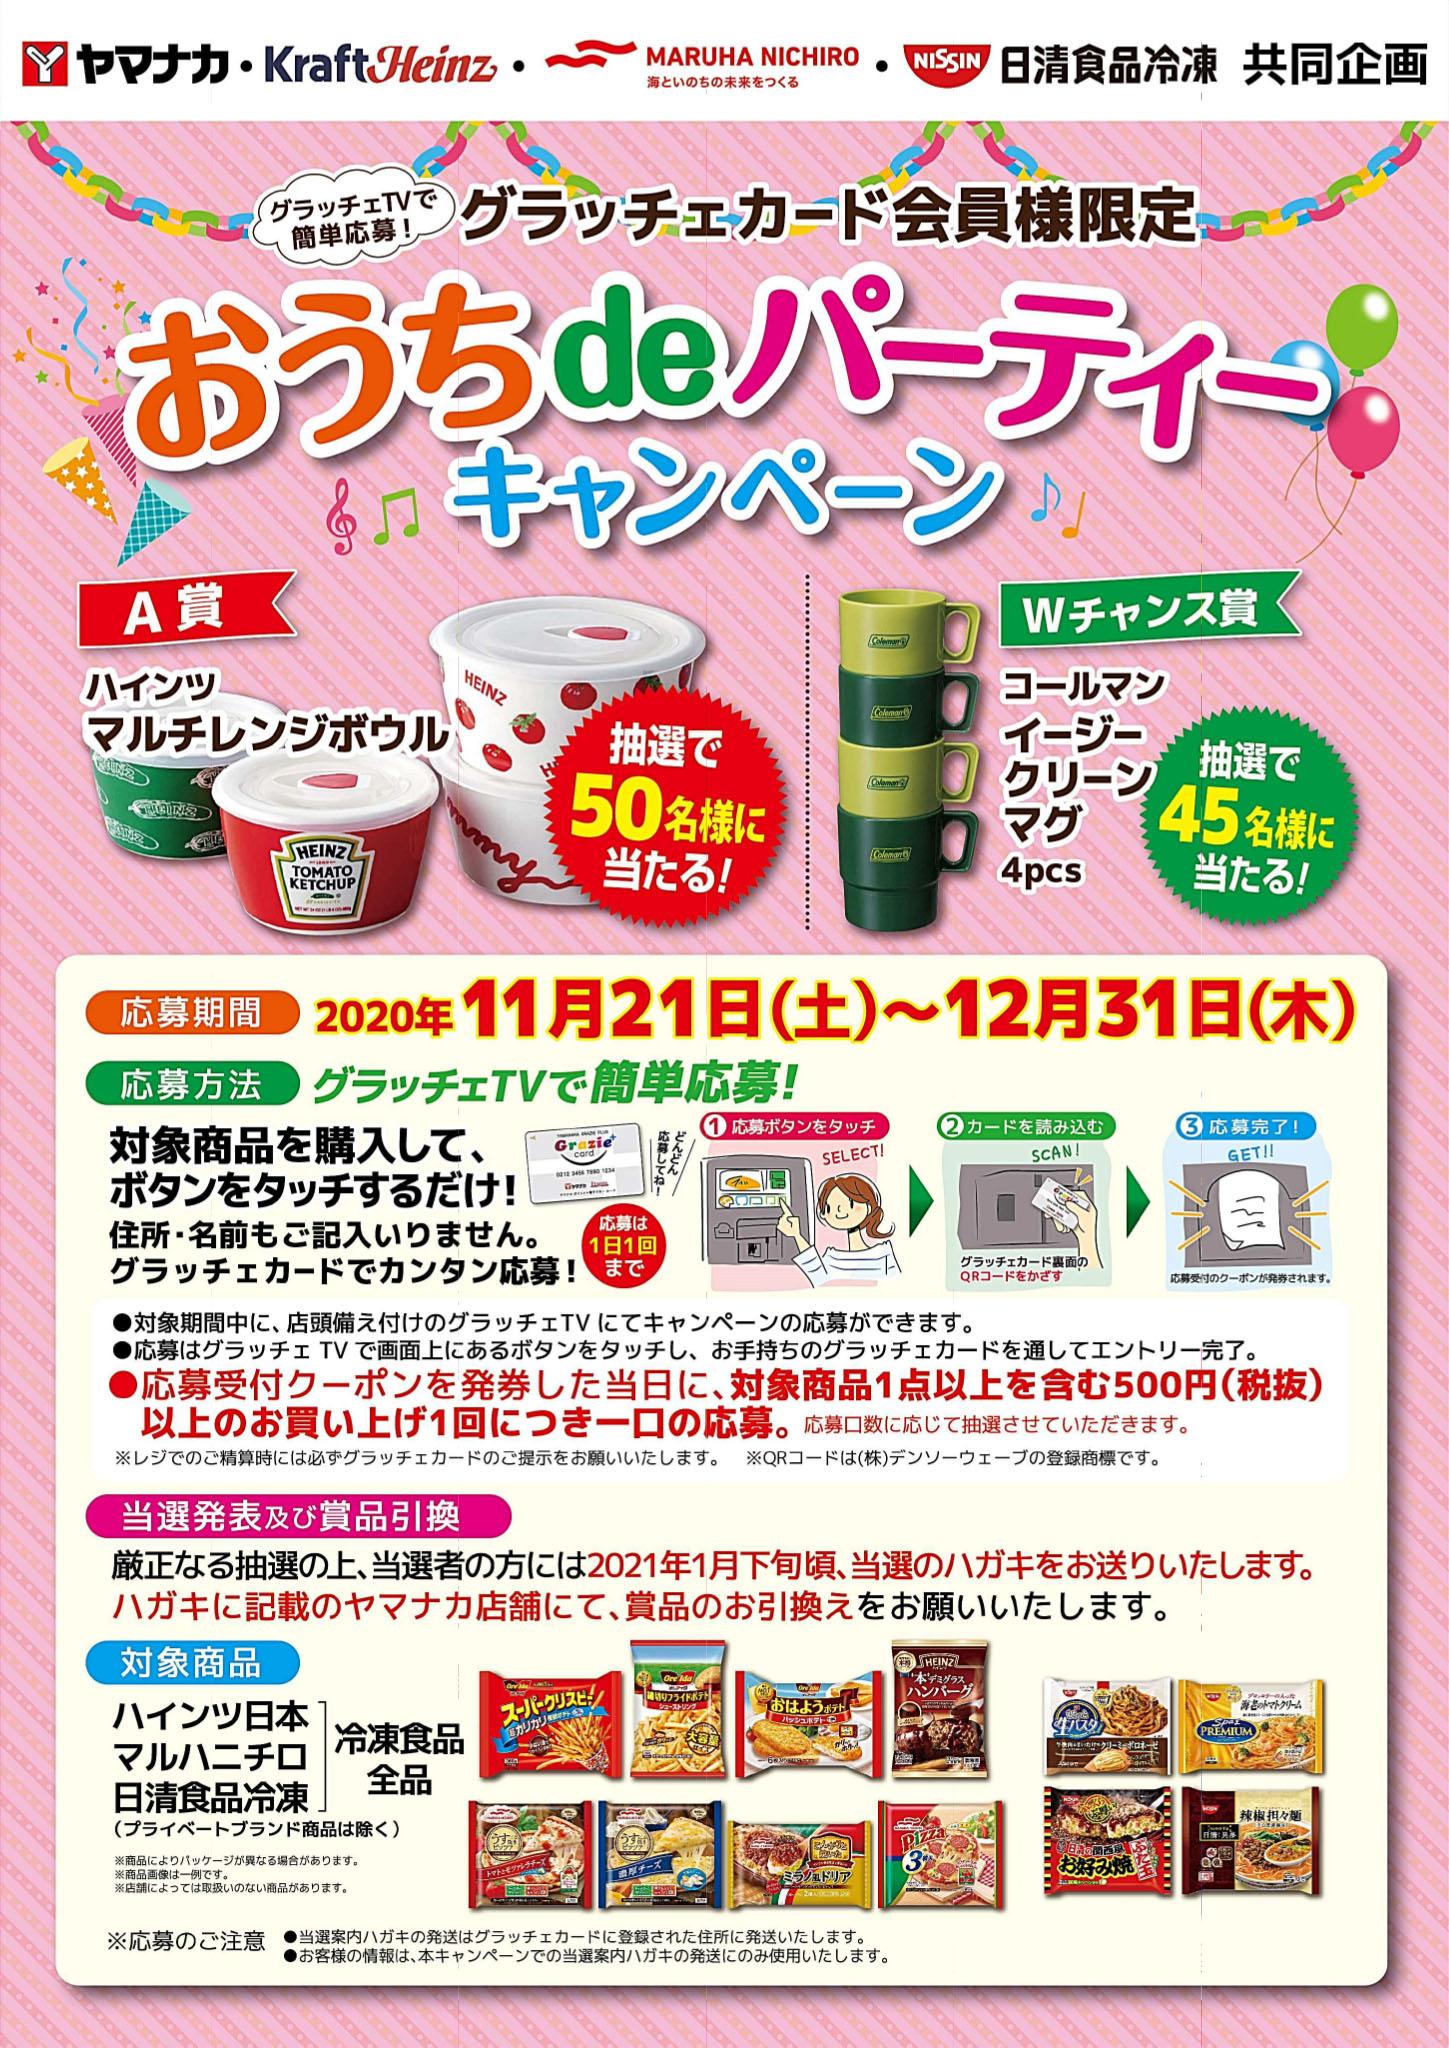 https://www.super-yamanaka.co.jp/wp/super/wp-content/uploads/2020/11/201121_grazie_campaign_heinz_maruha_nissin.jpg